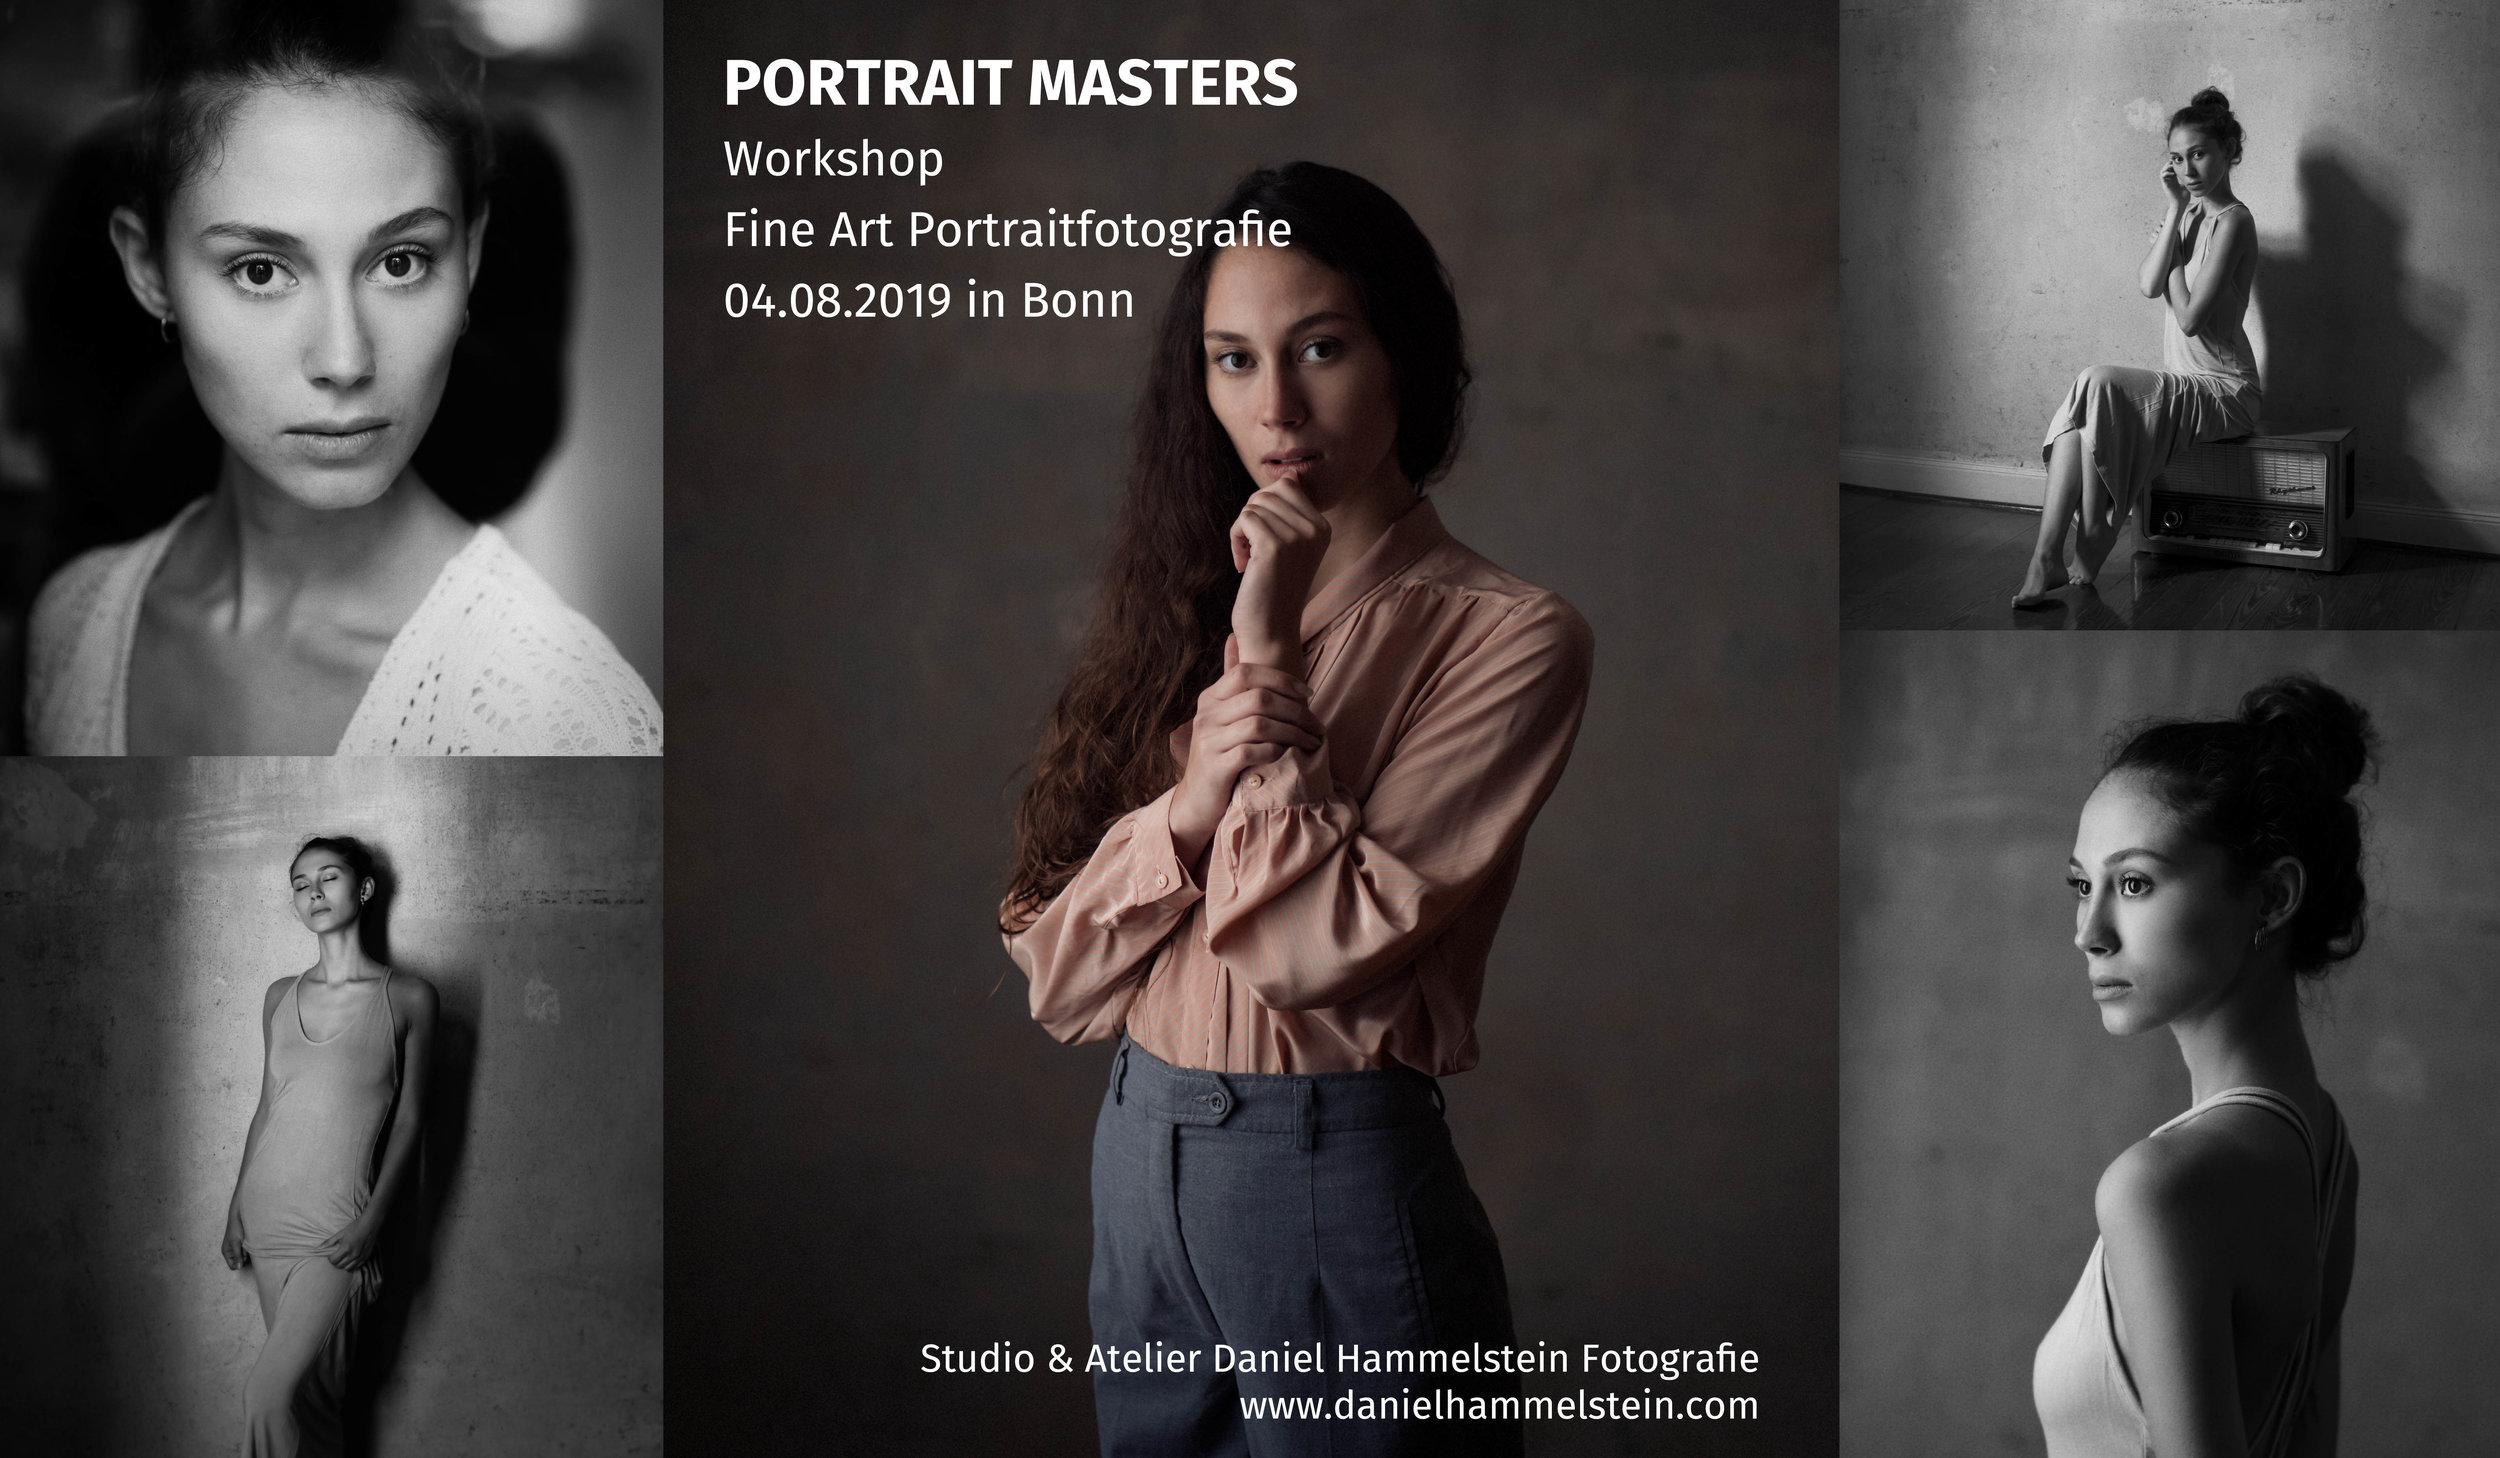 Portrait Workshop Portraitfotografie Schwarzweissfotografie Fotoworkshop Fotokurs Bonn Köln Düsseldorf NRW August 2019.jpg